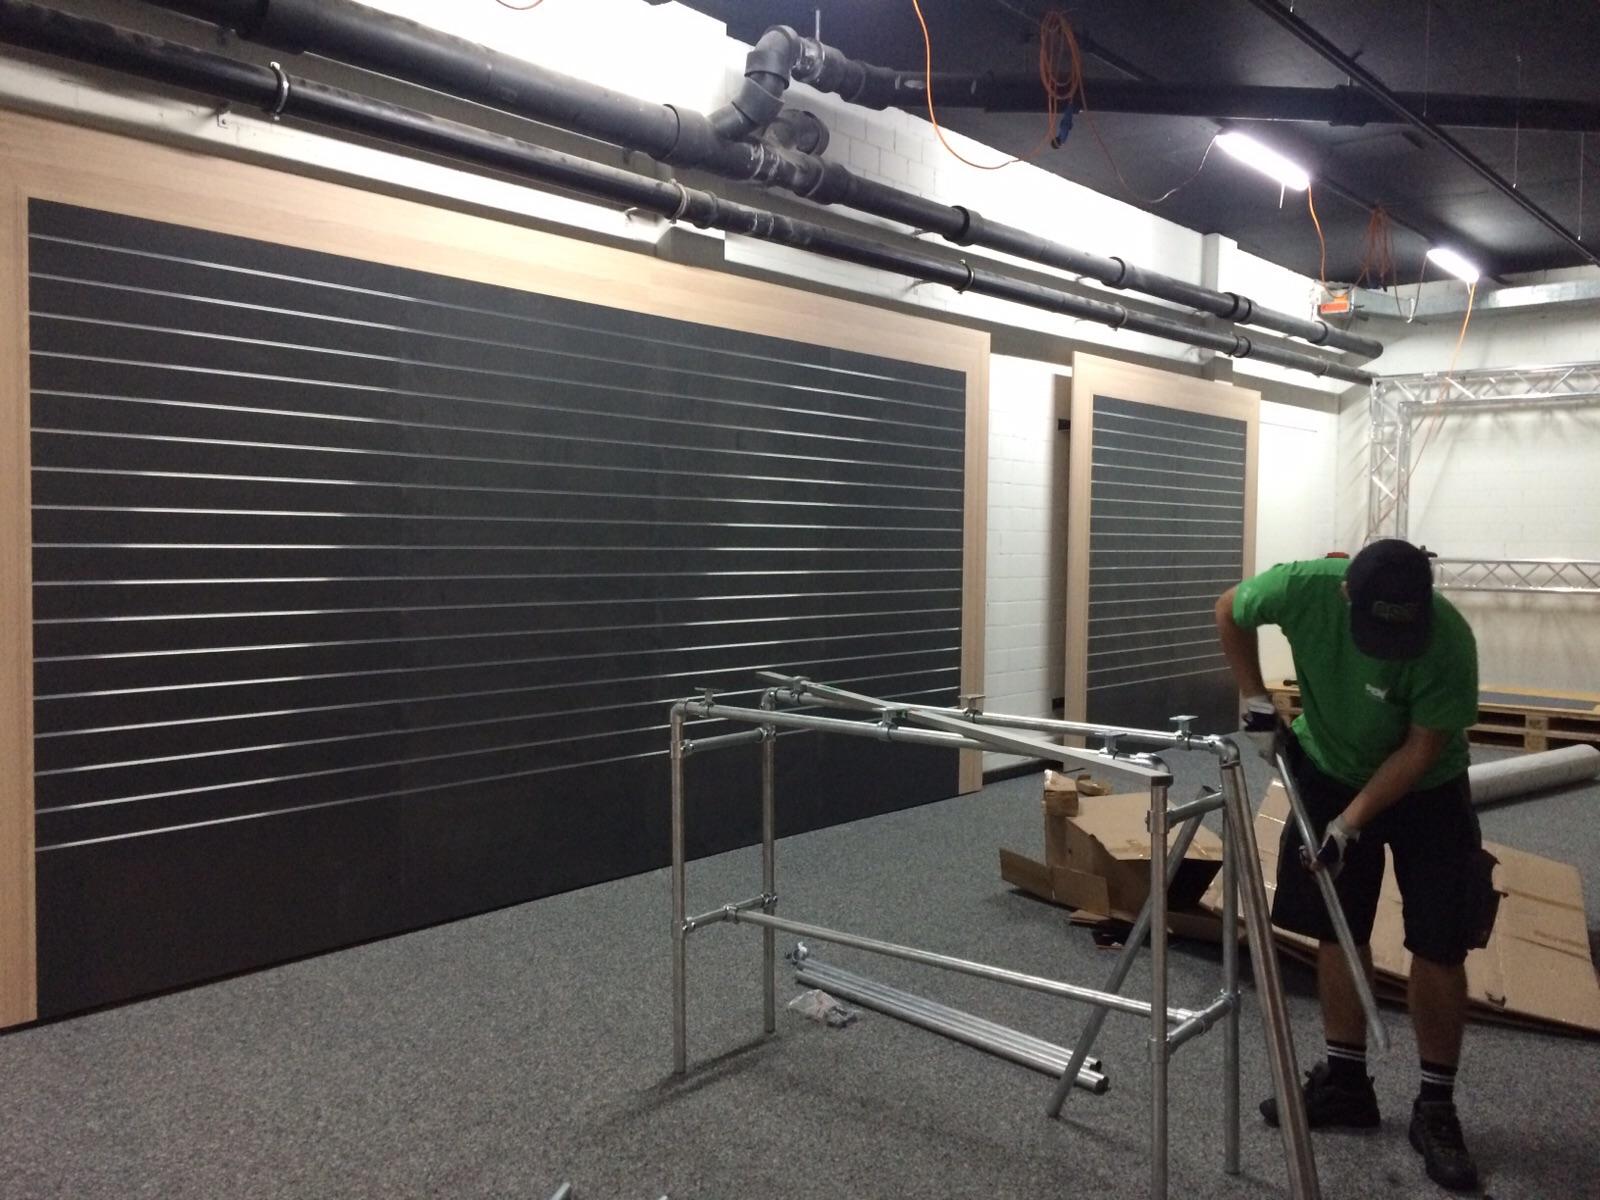 Brack Showroom Baustellenbericht 20150911 (23).JPG